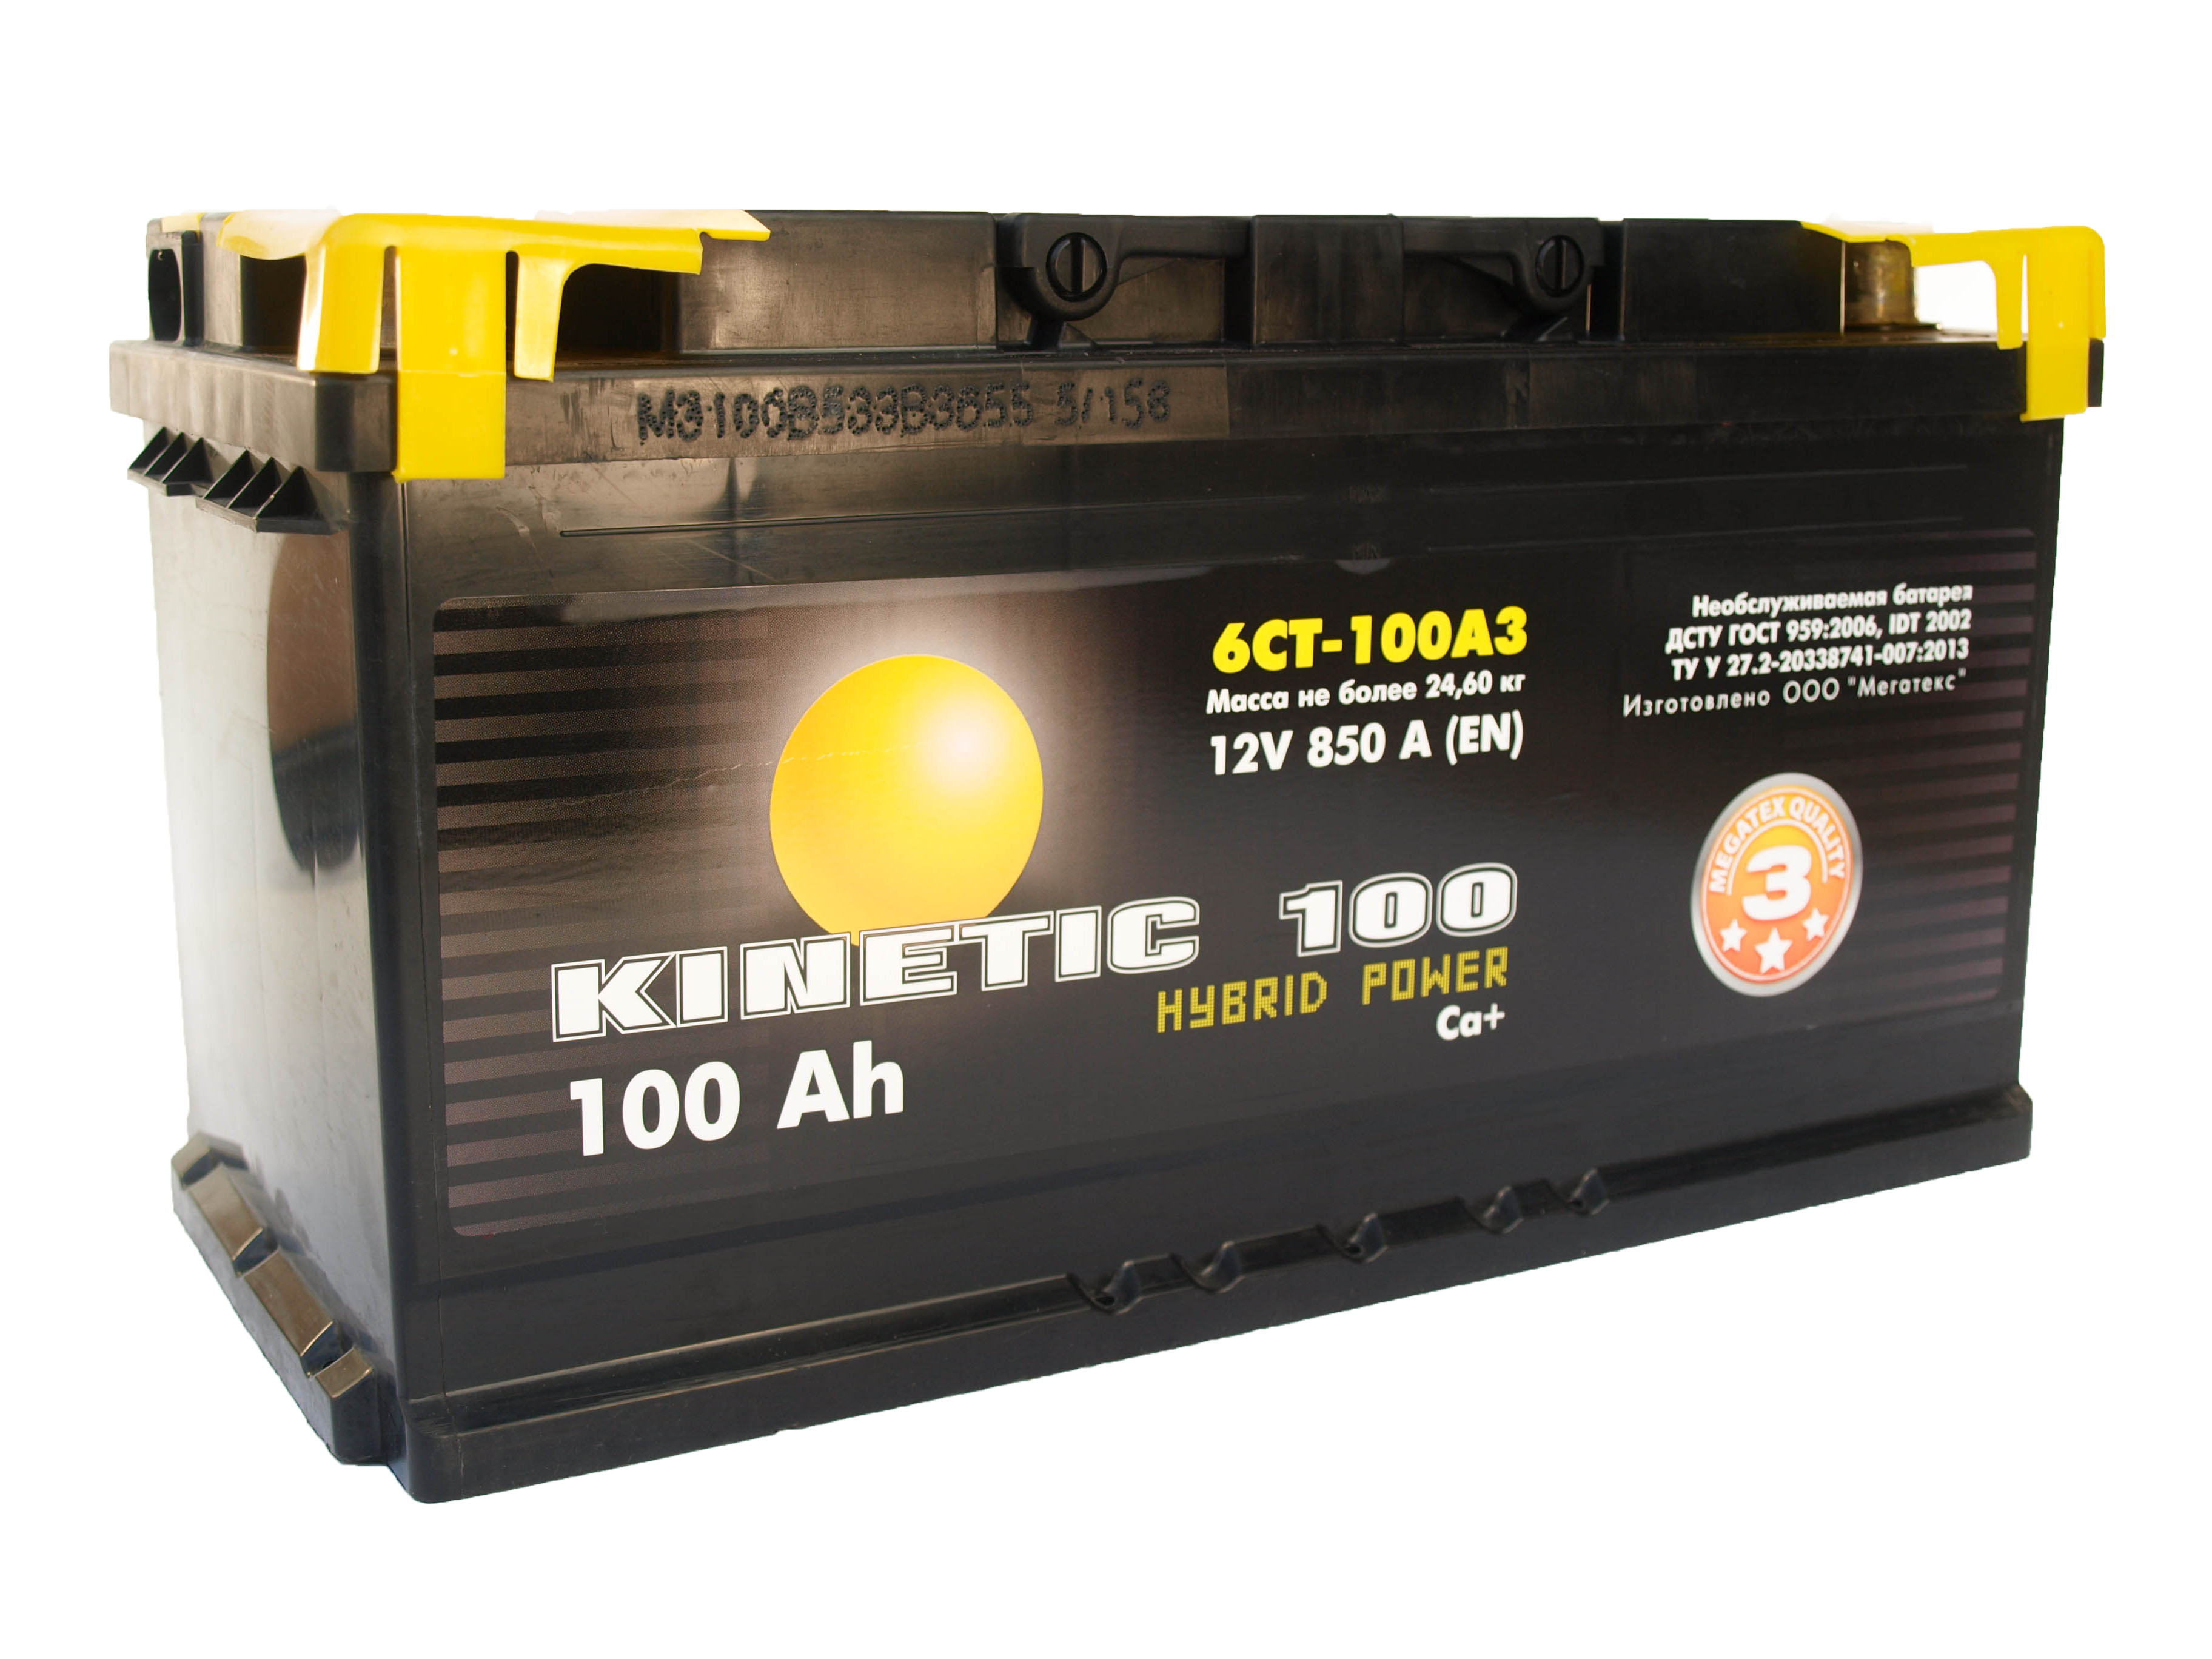 Купить Аккумулятор Kinetic Hybrid 100 Ah (0) 850 A